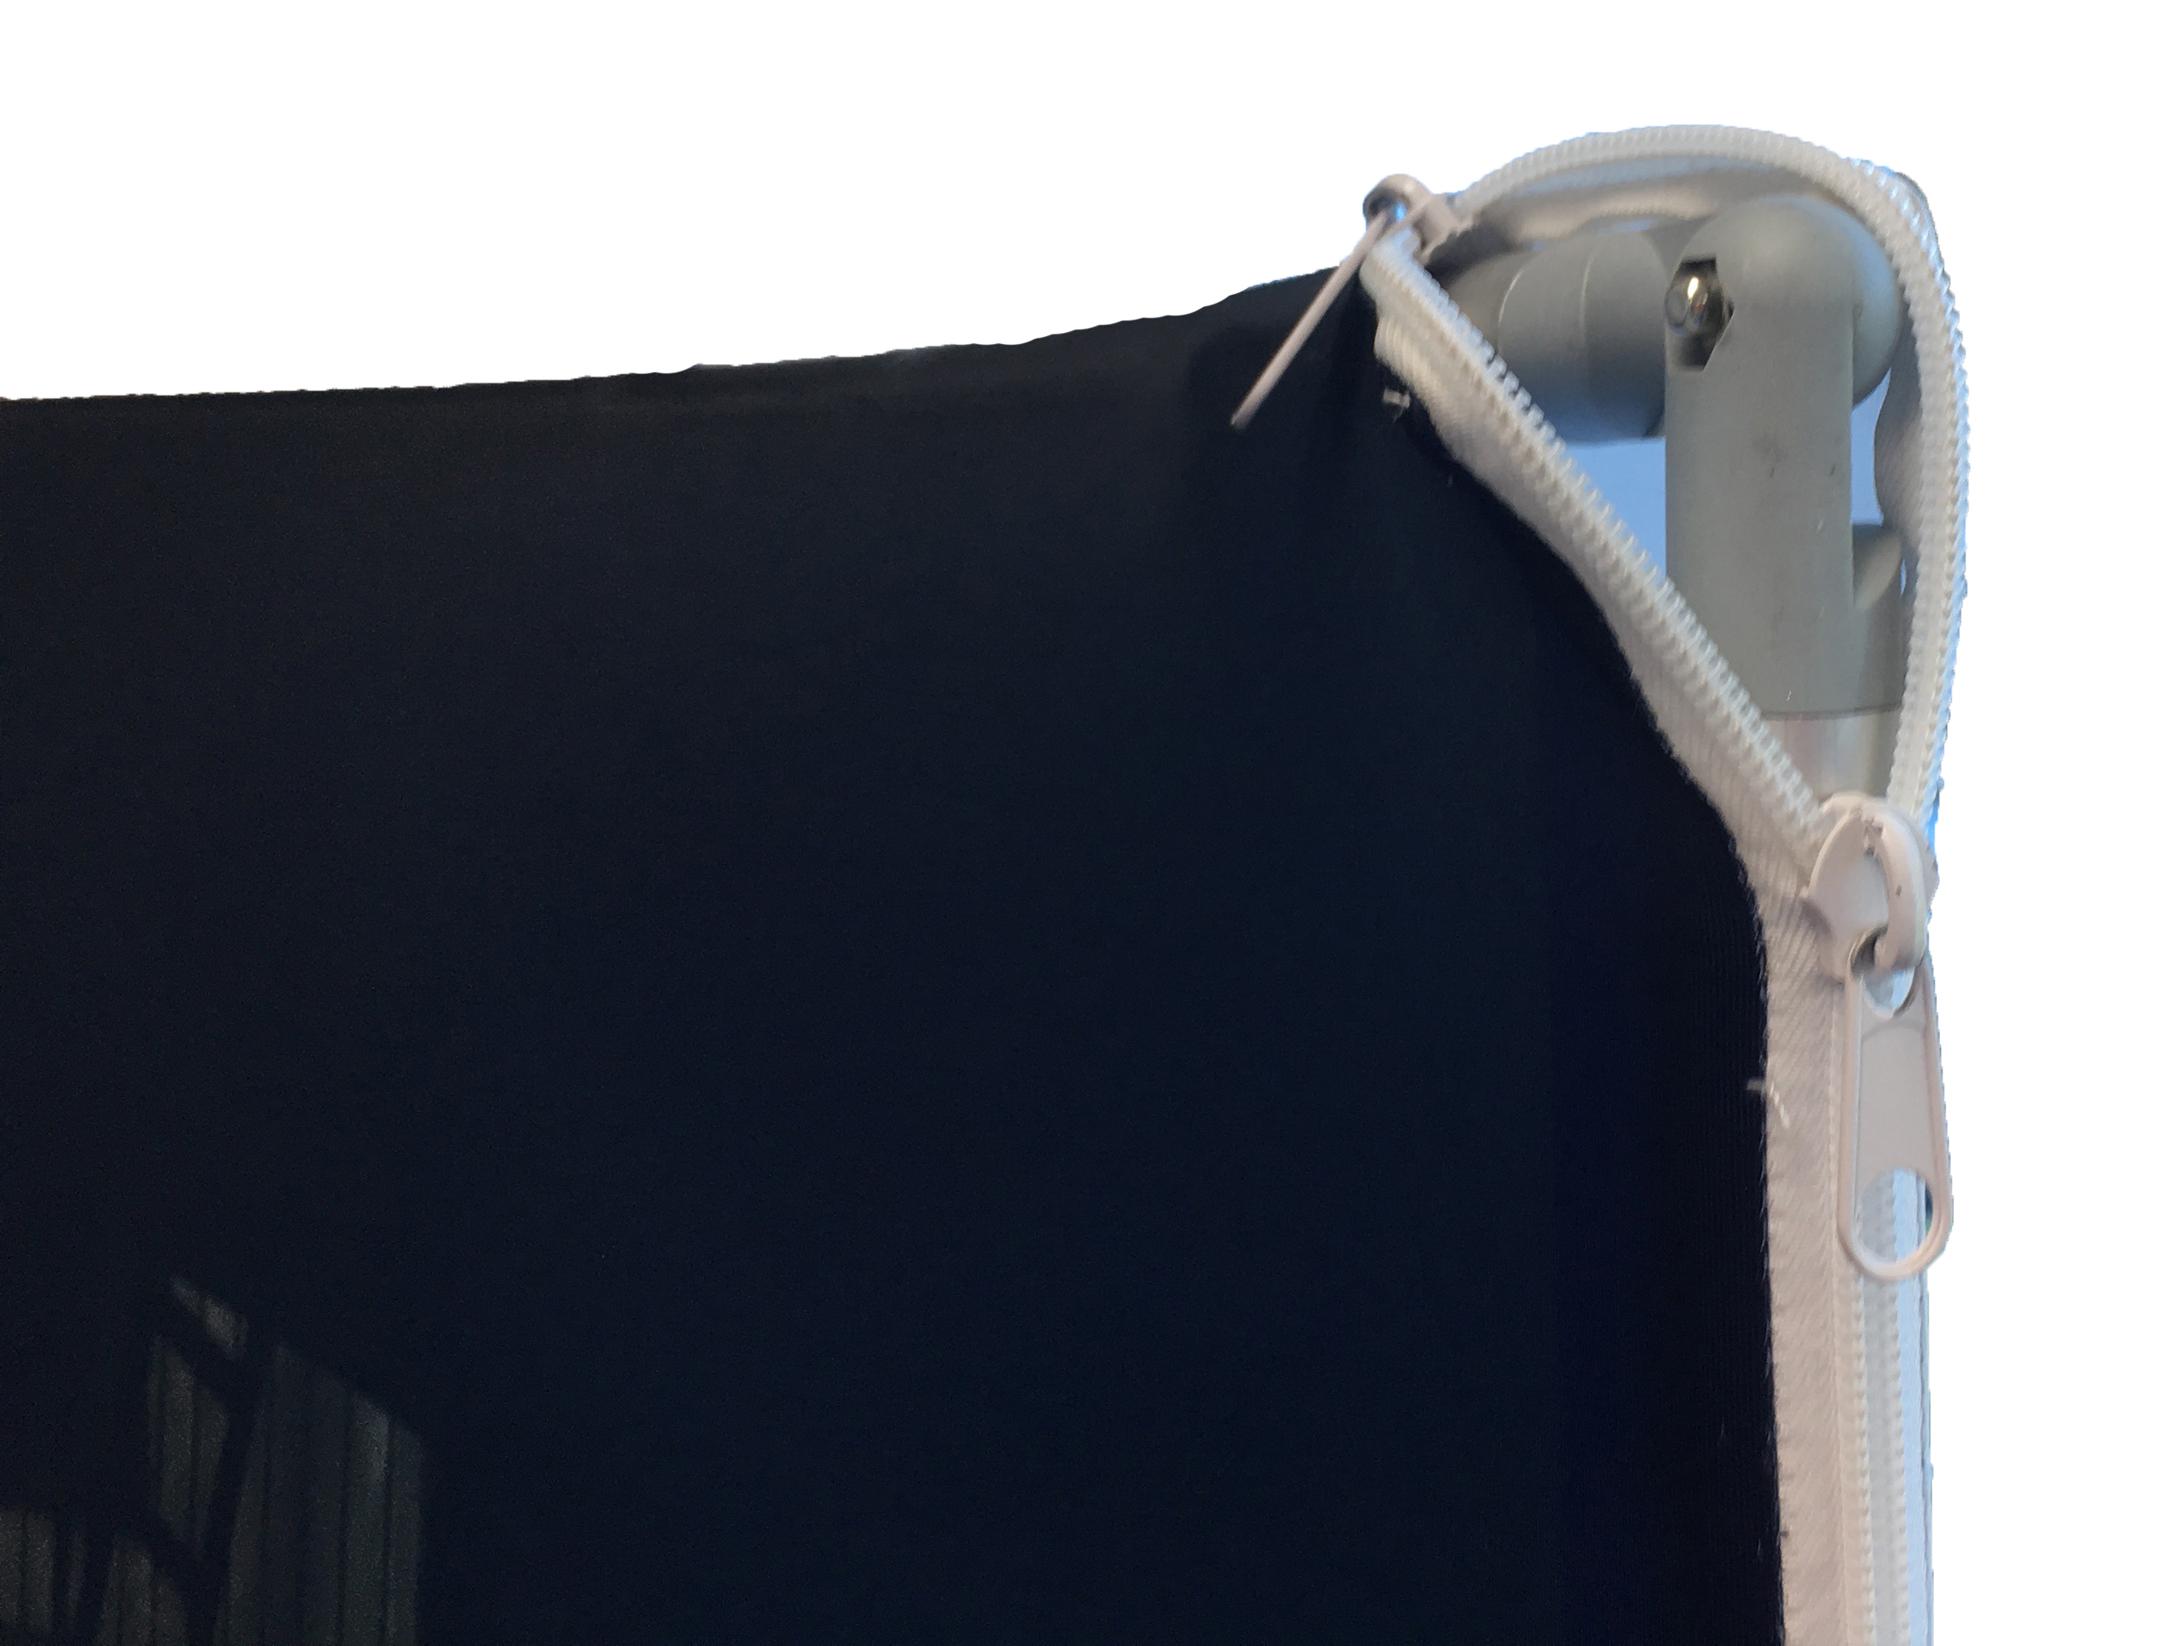 Kwik Zip Wall Display - close up of heavy duty zip that secures fabric print to aluminium display